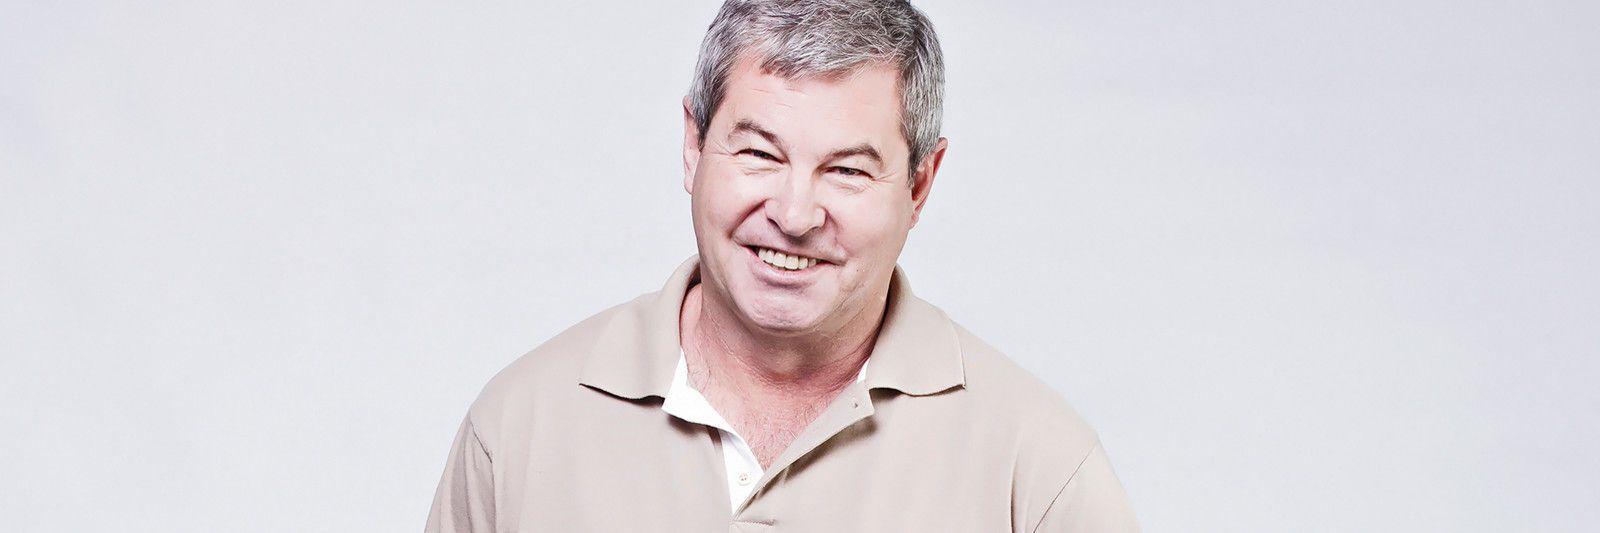 PARTNER DAVID VLOK - Jolene Aucamp